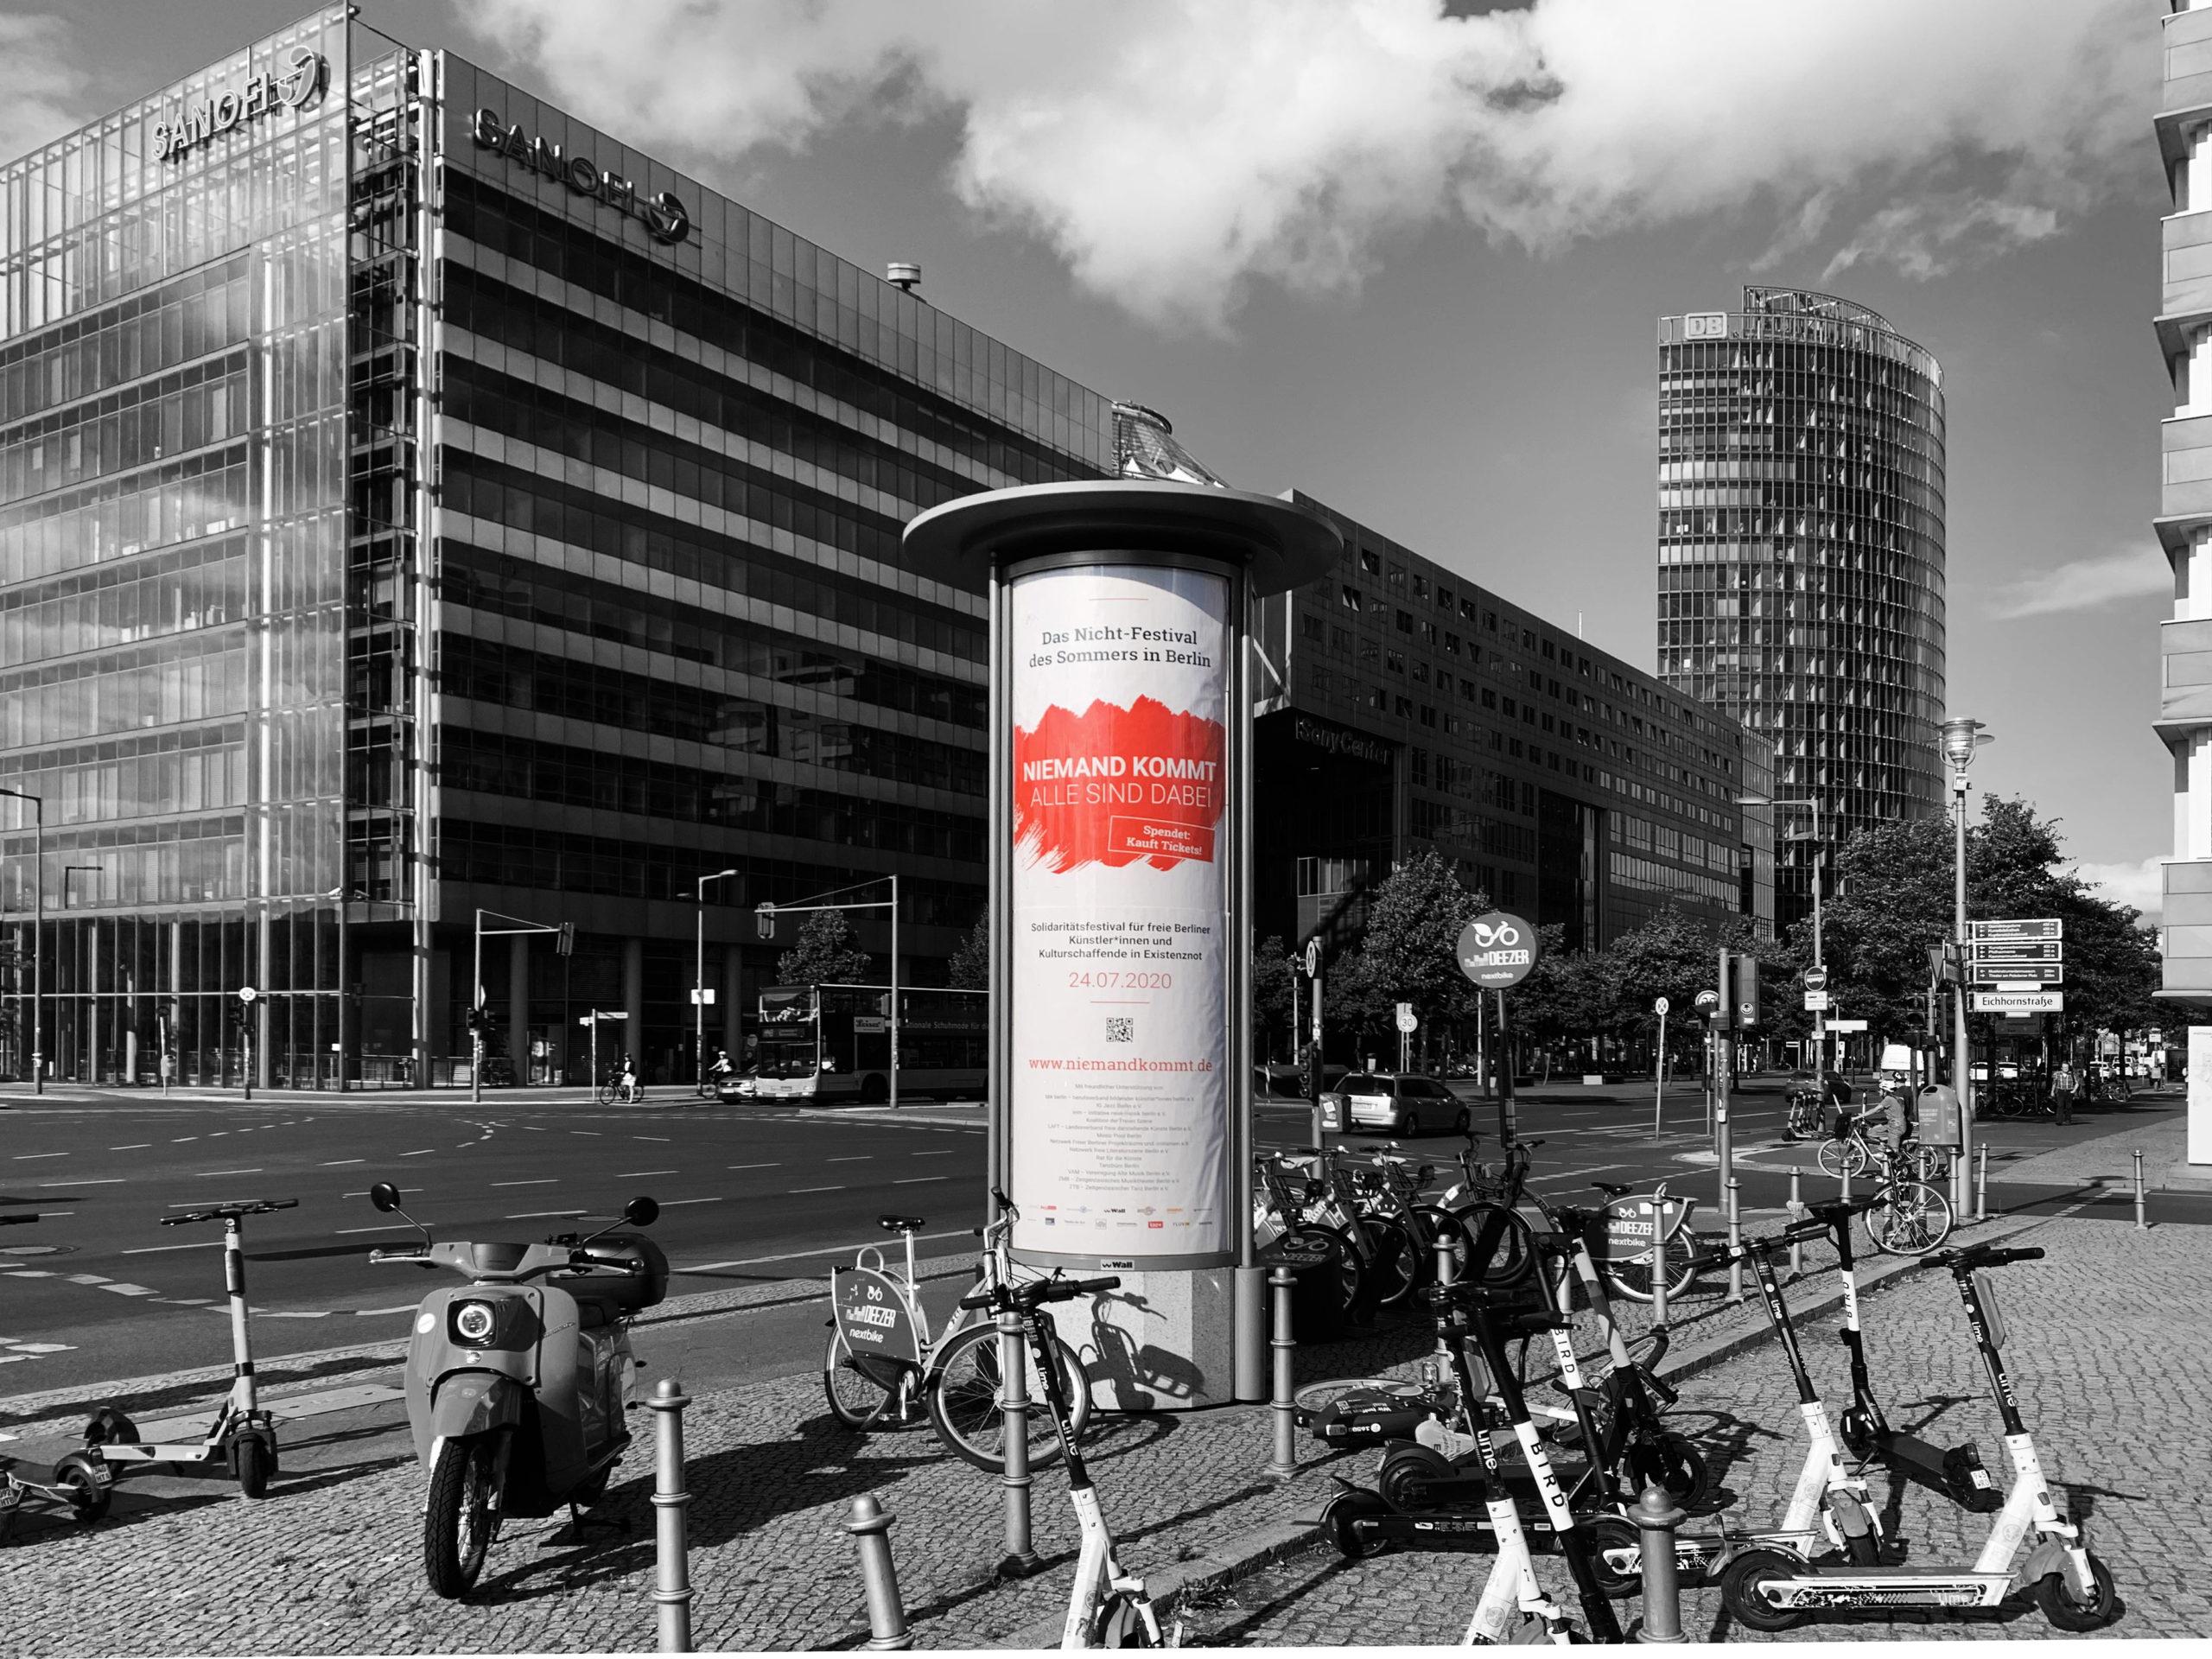 Niemand kommt - Potsdamer Platz